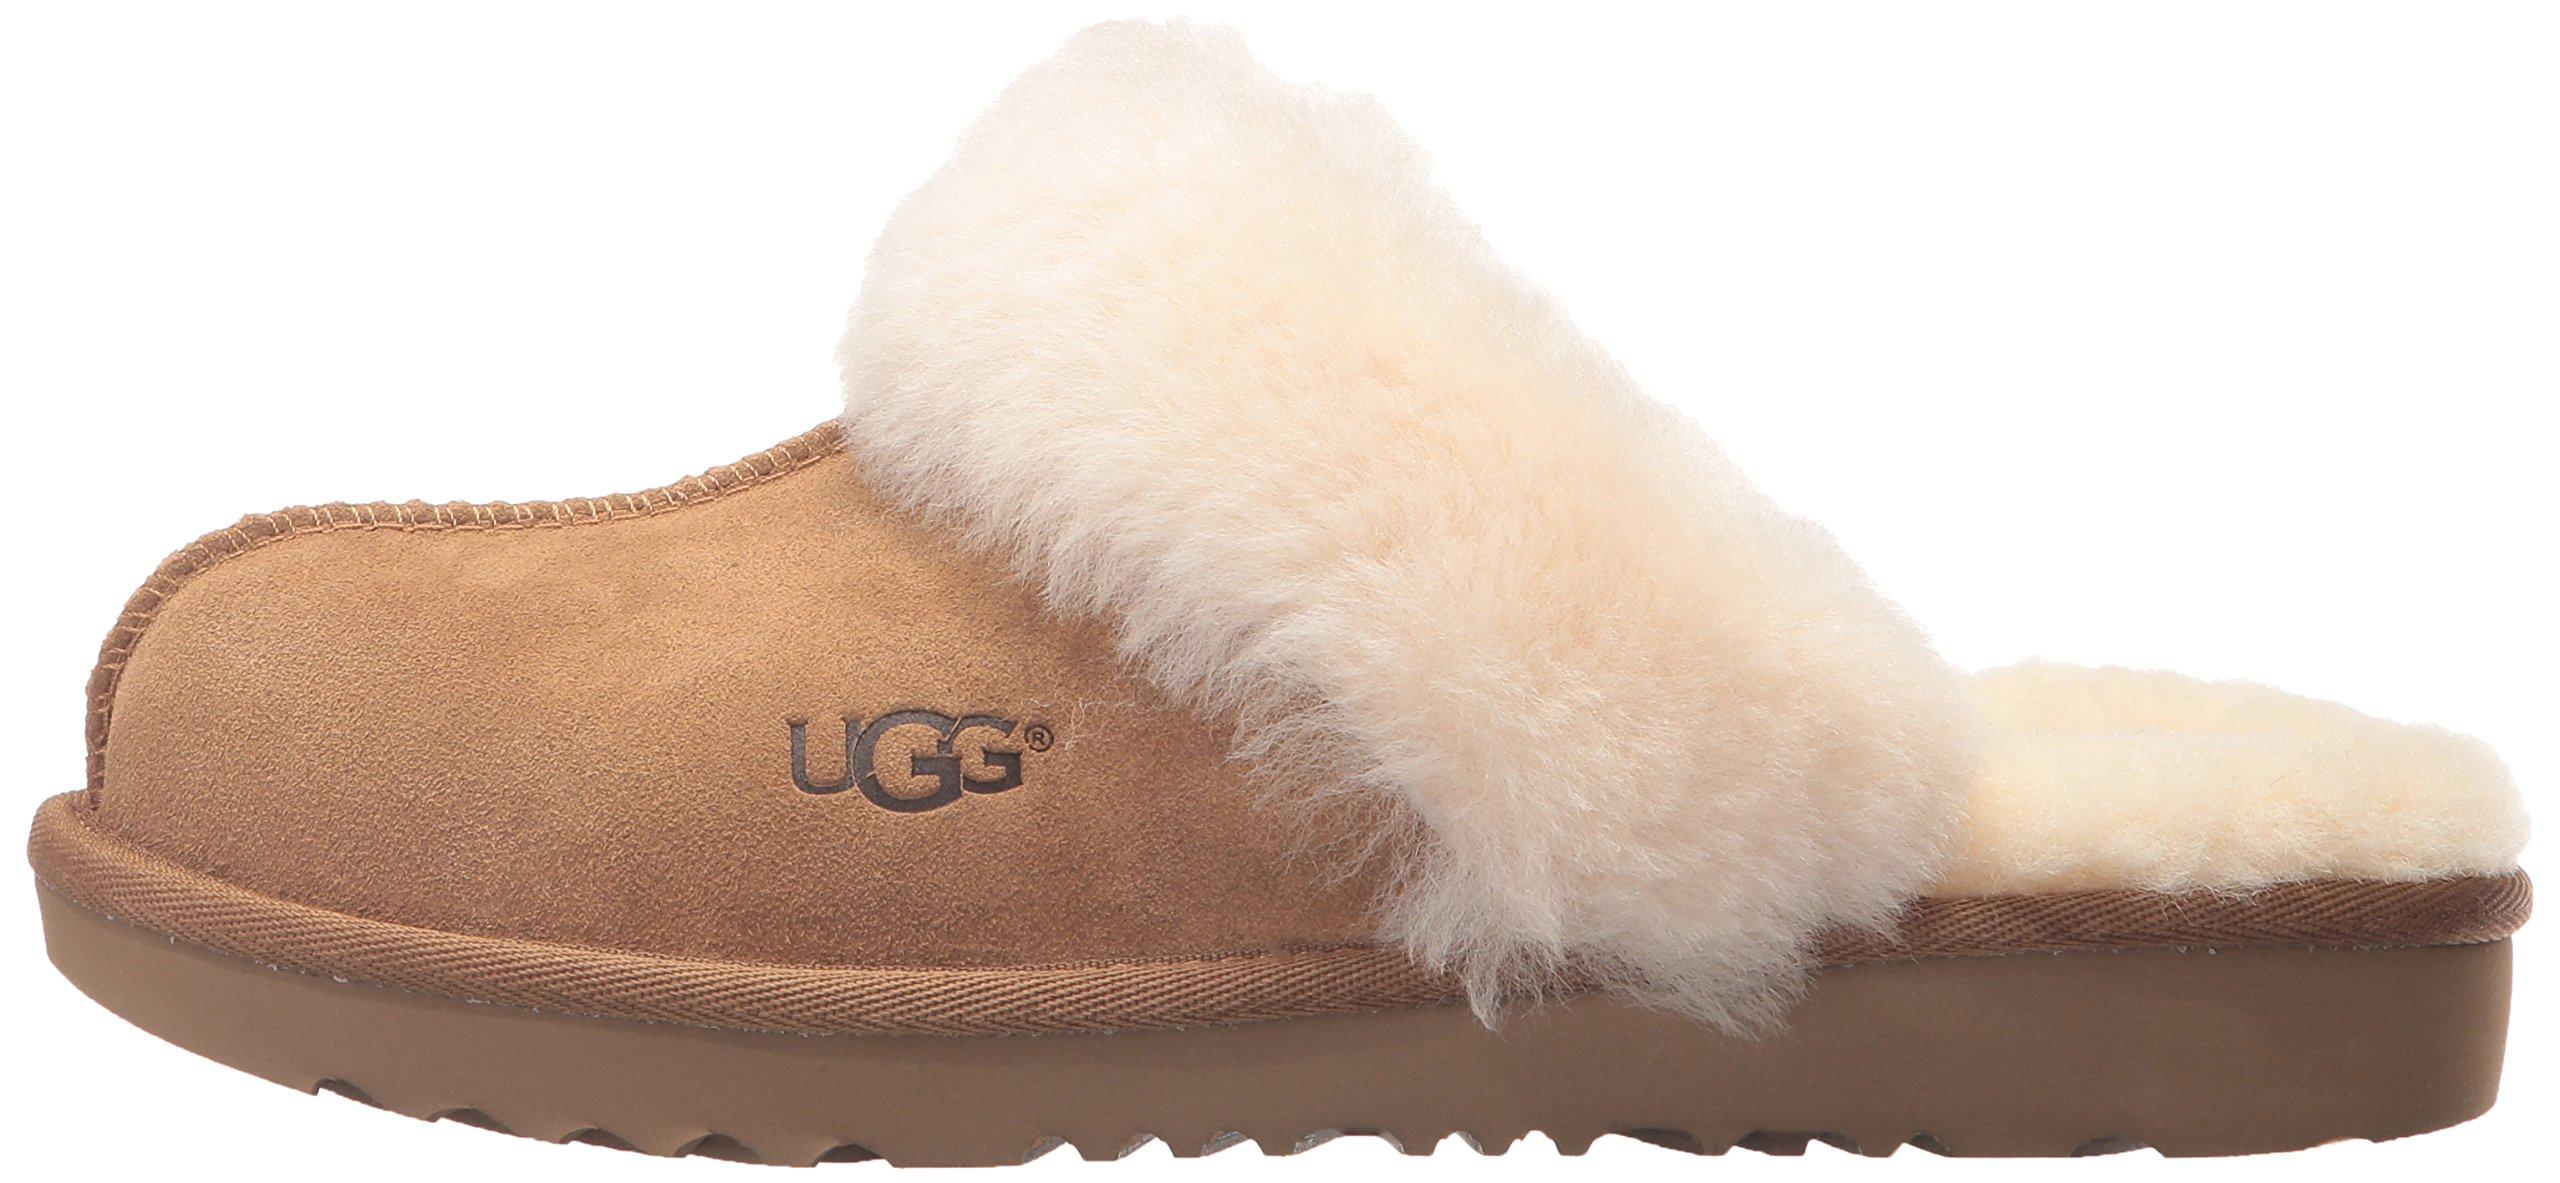 UGG Girls K Cozy II Slipper, Chestnut, 13 M US Little Kid by UGG (Image #5)